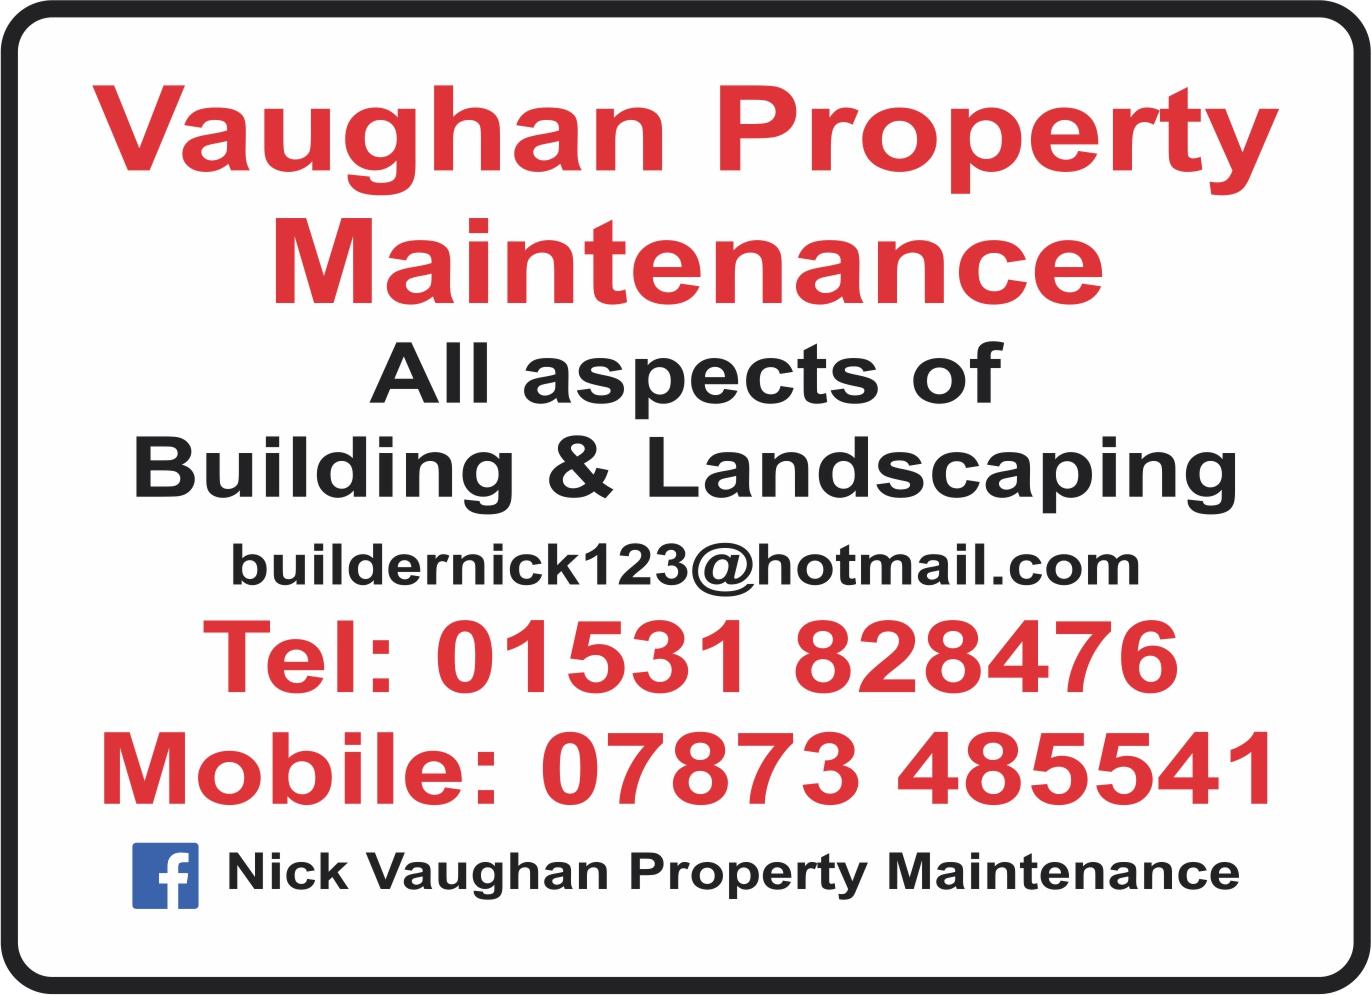 Vaughan Property Maintenance